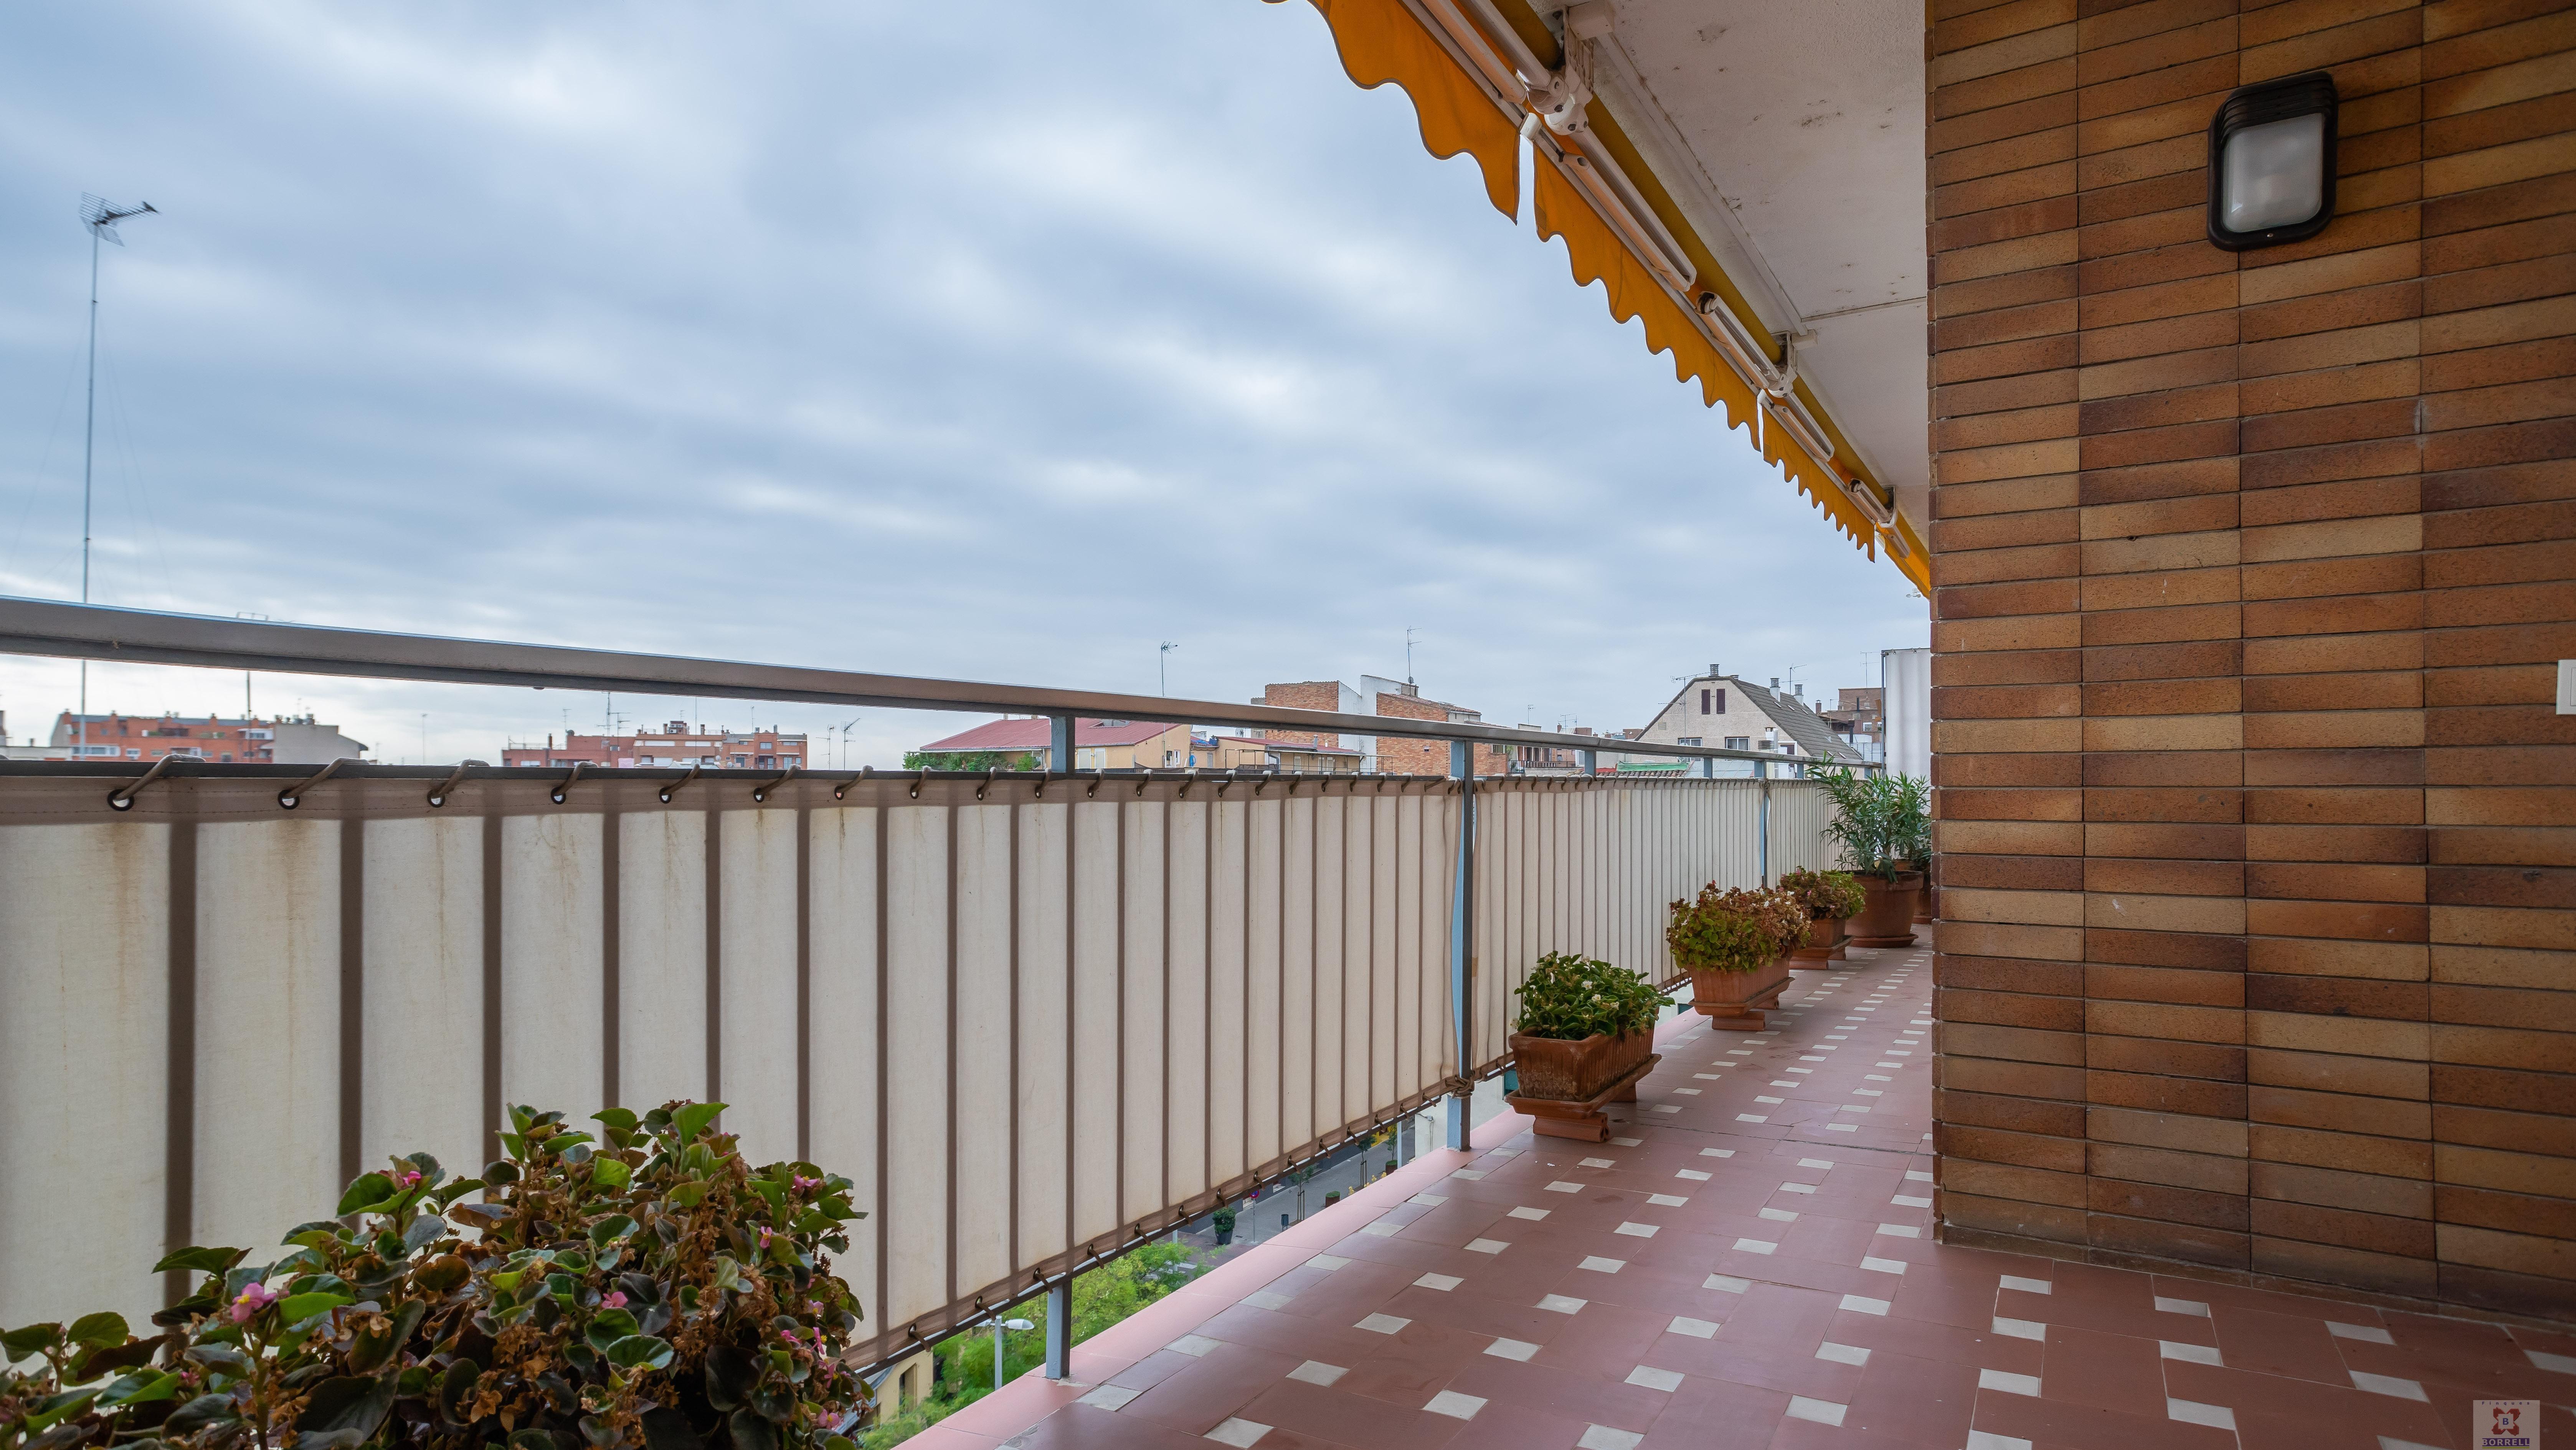 Alquiler Piso  Rambla  ferran, 52. Lleida/piso